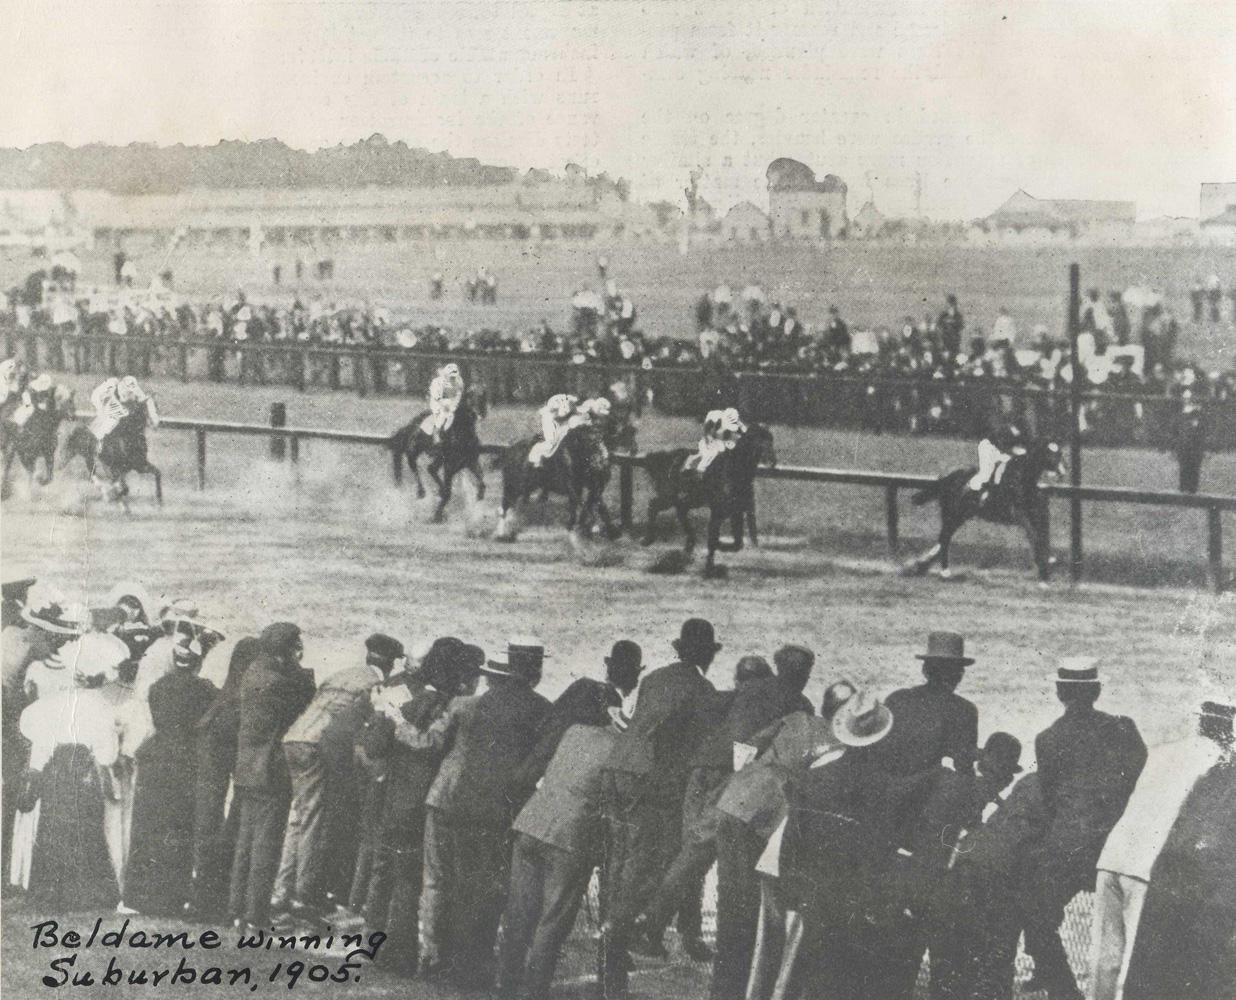 Beldame (Frank O'Neill up) winning the 1905 Suburban Handicap at Sheepshead Bay (Museum Collection)